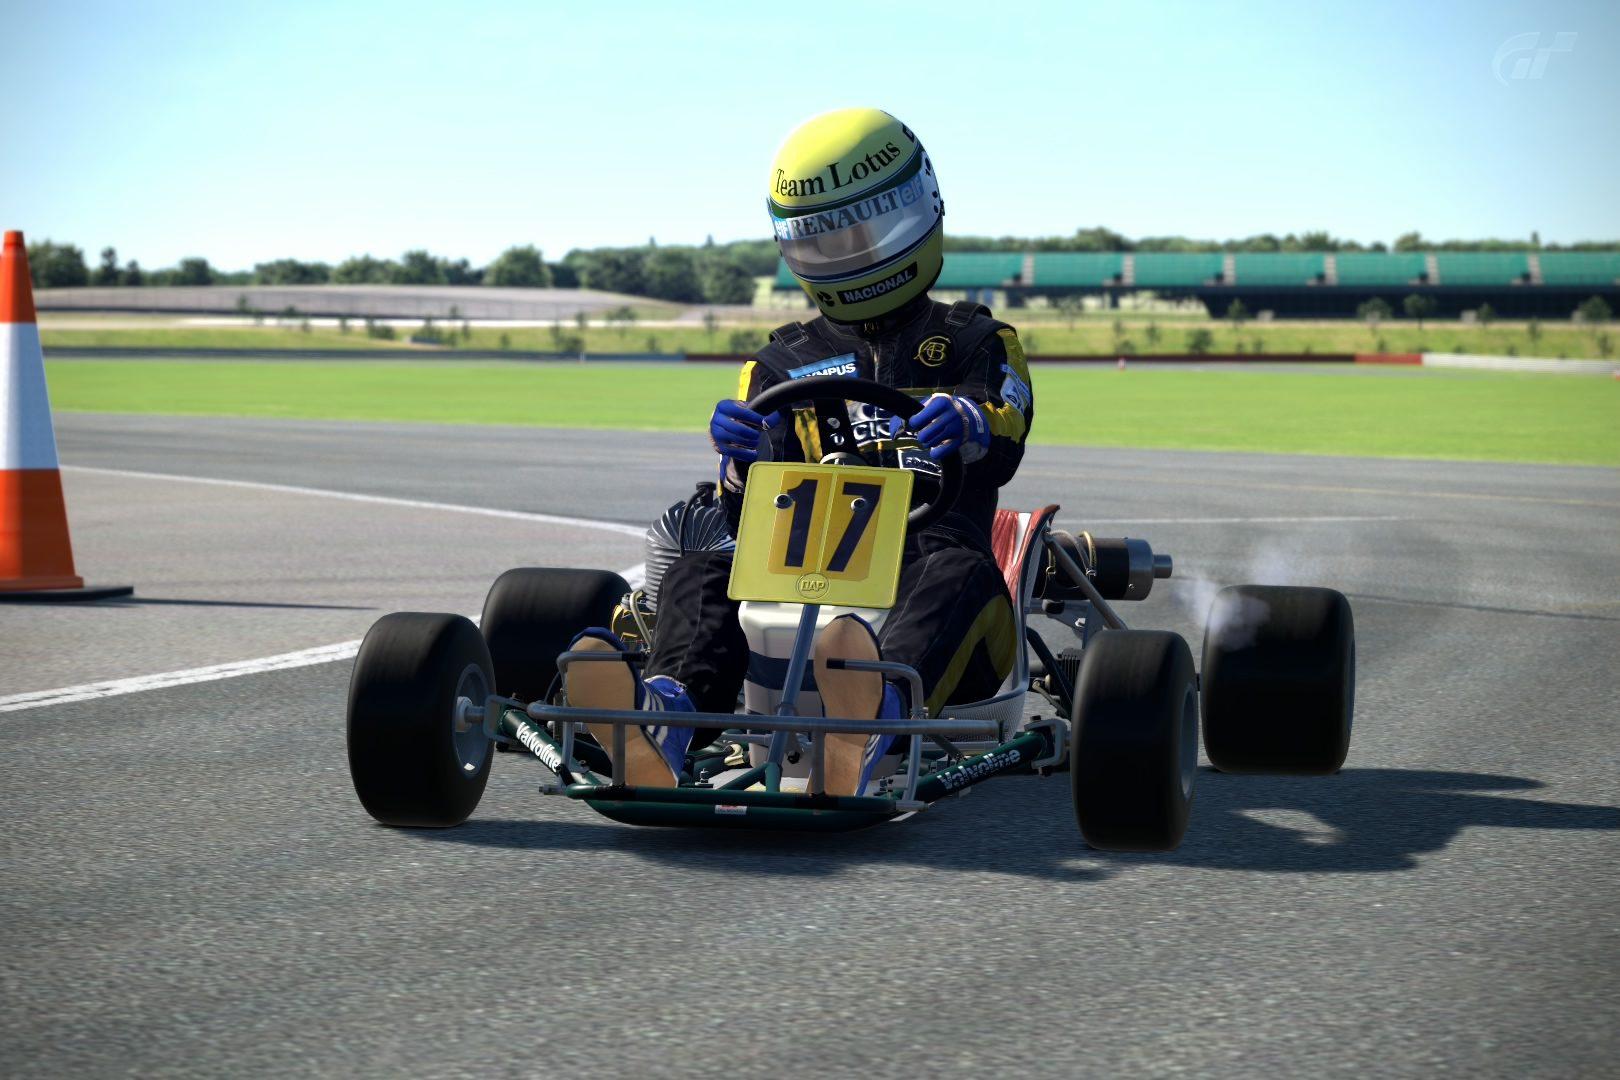 SennaKartImg2.jpg